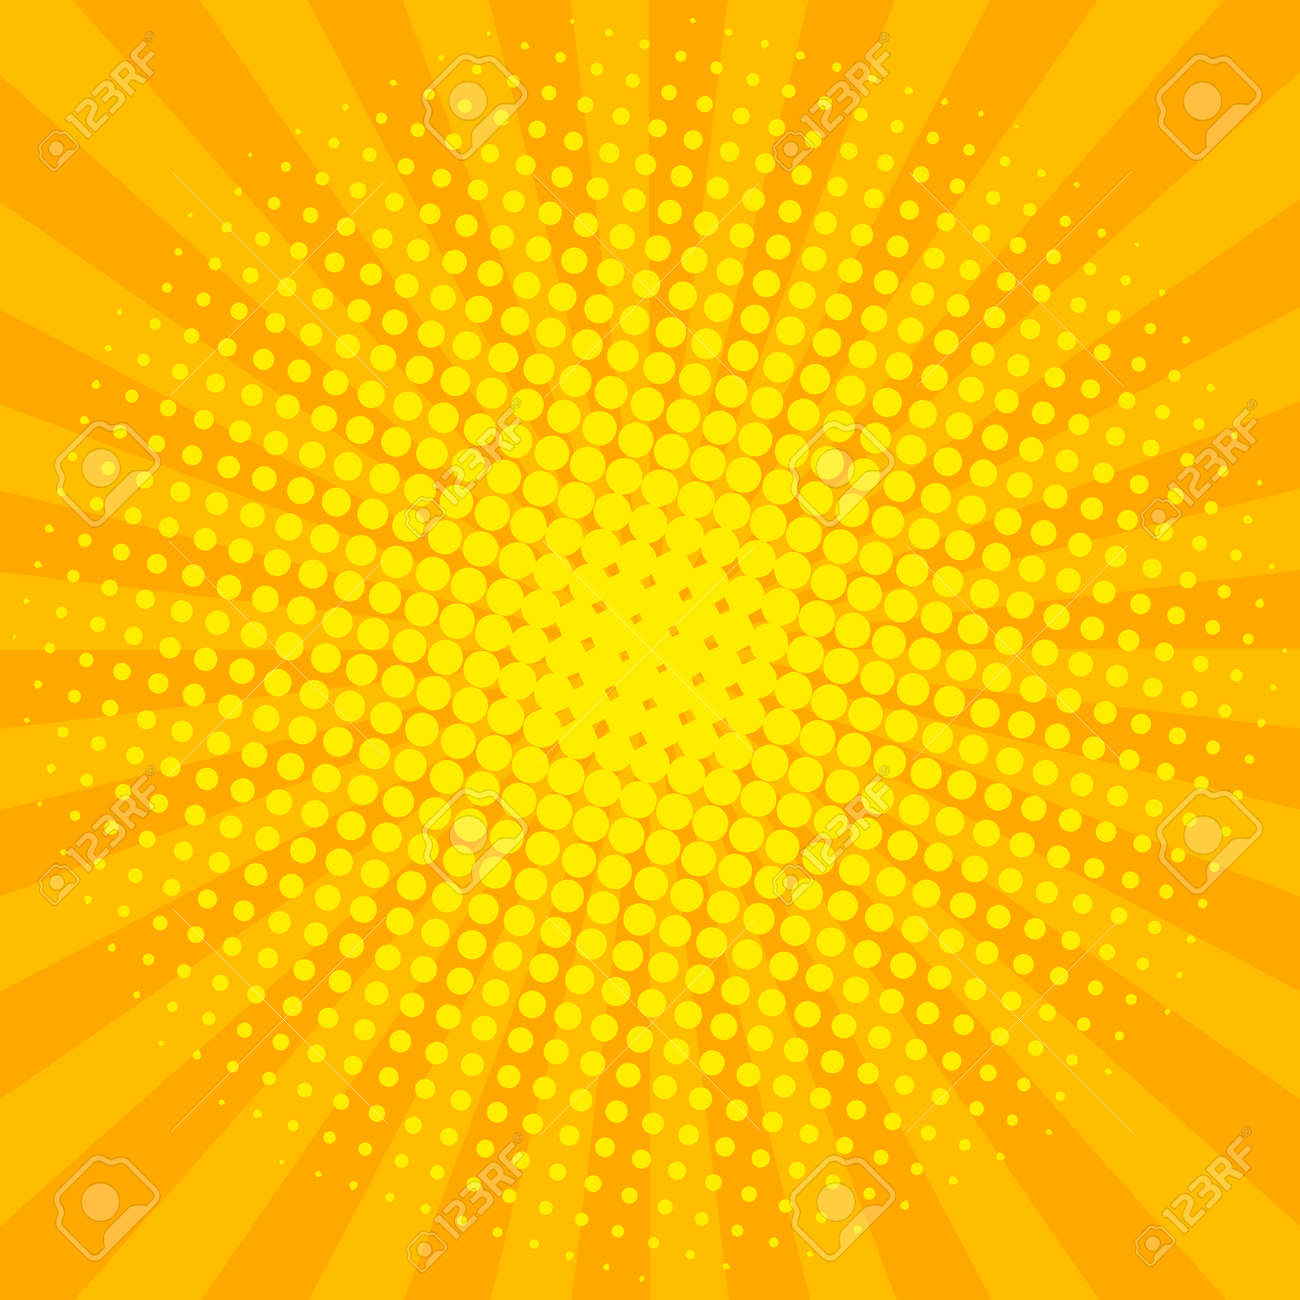 Yellow sun shine halftone design background retro vector illustration. - 93396383